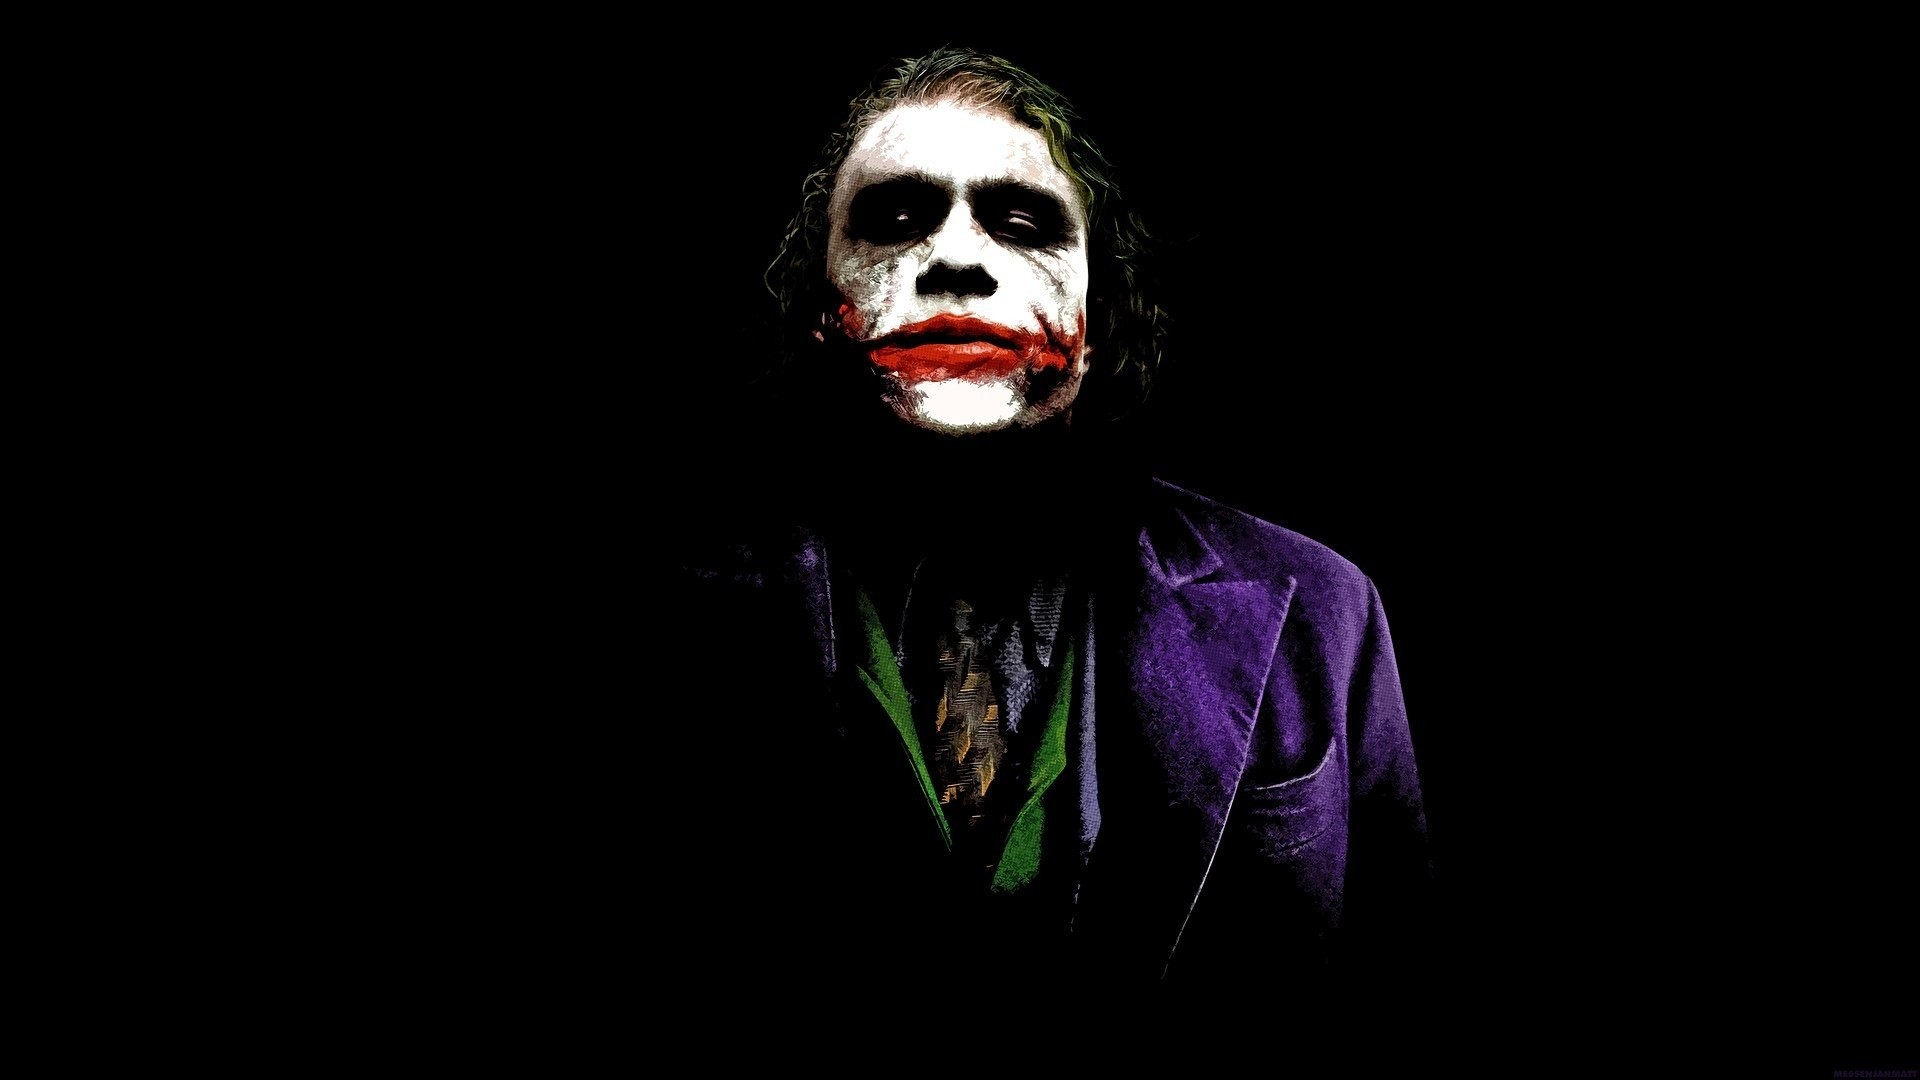 Heath Ledger Joker Wallpaper Wallpapertag